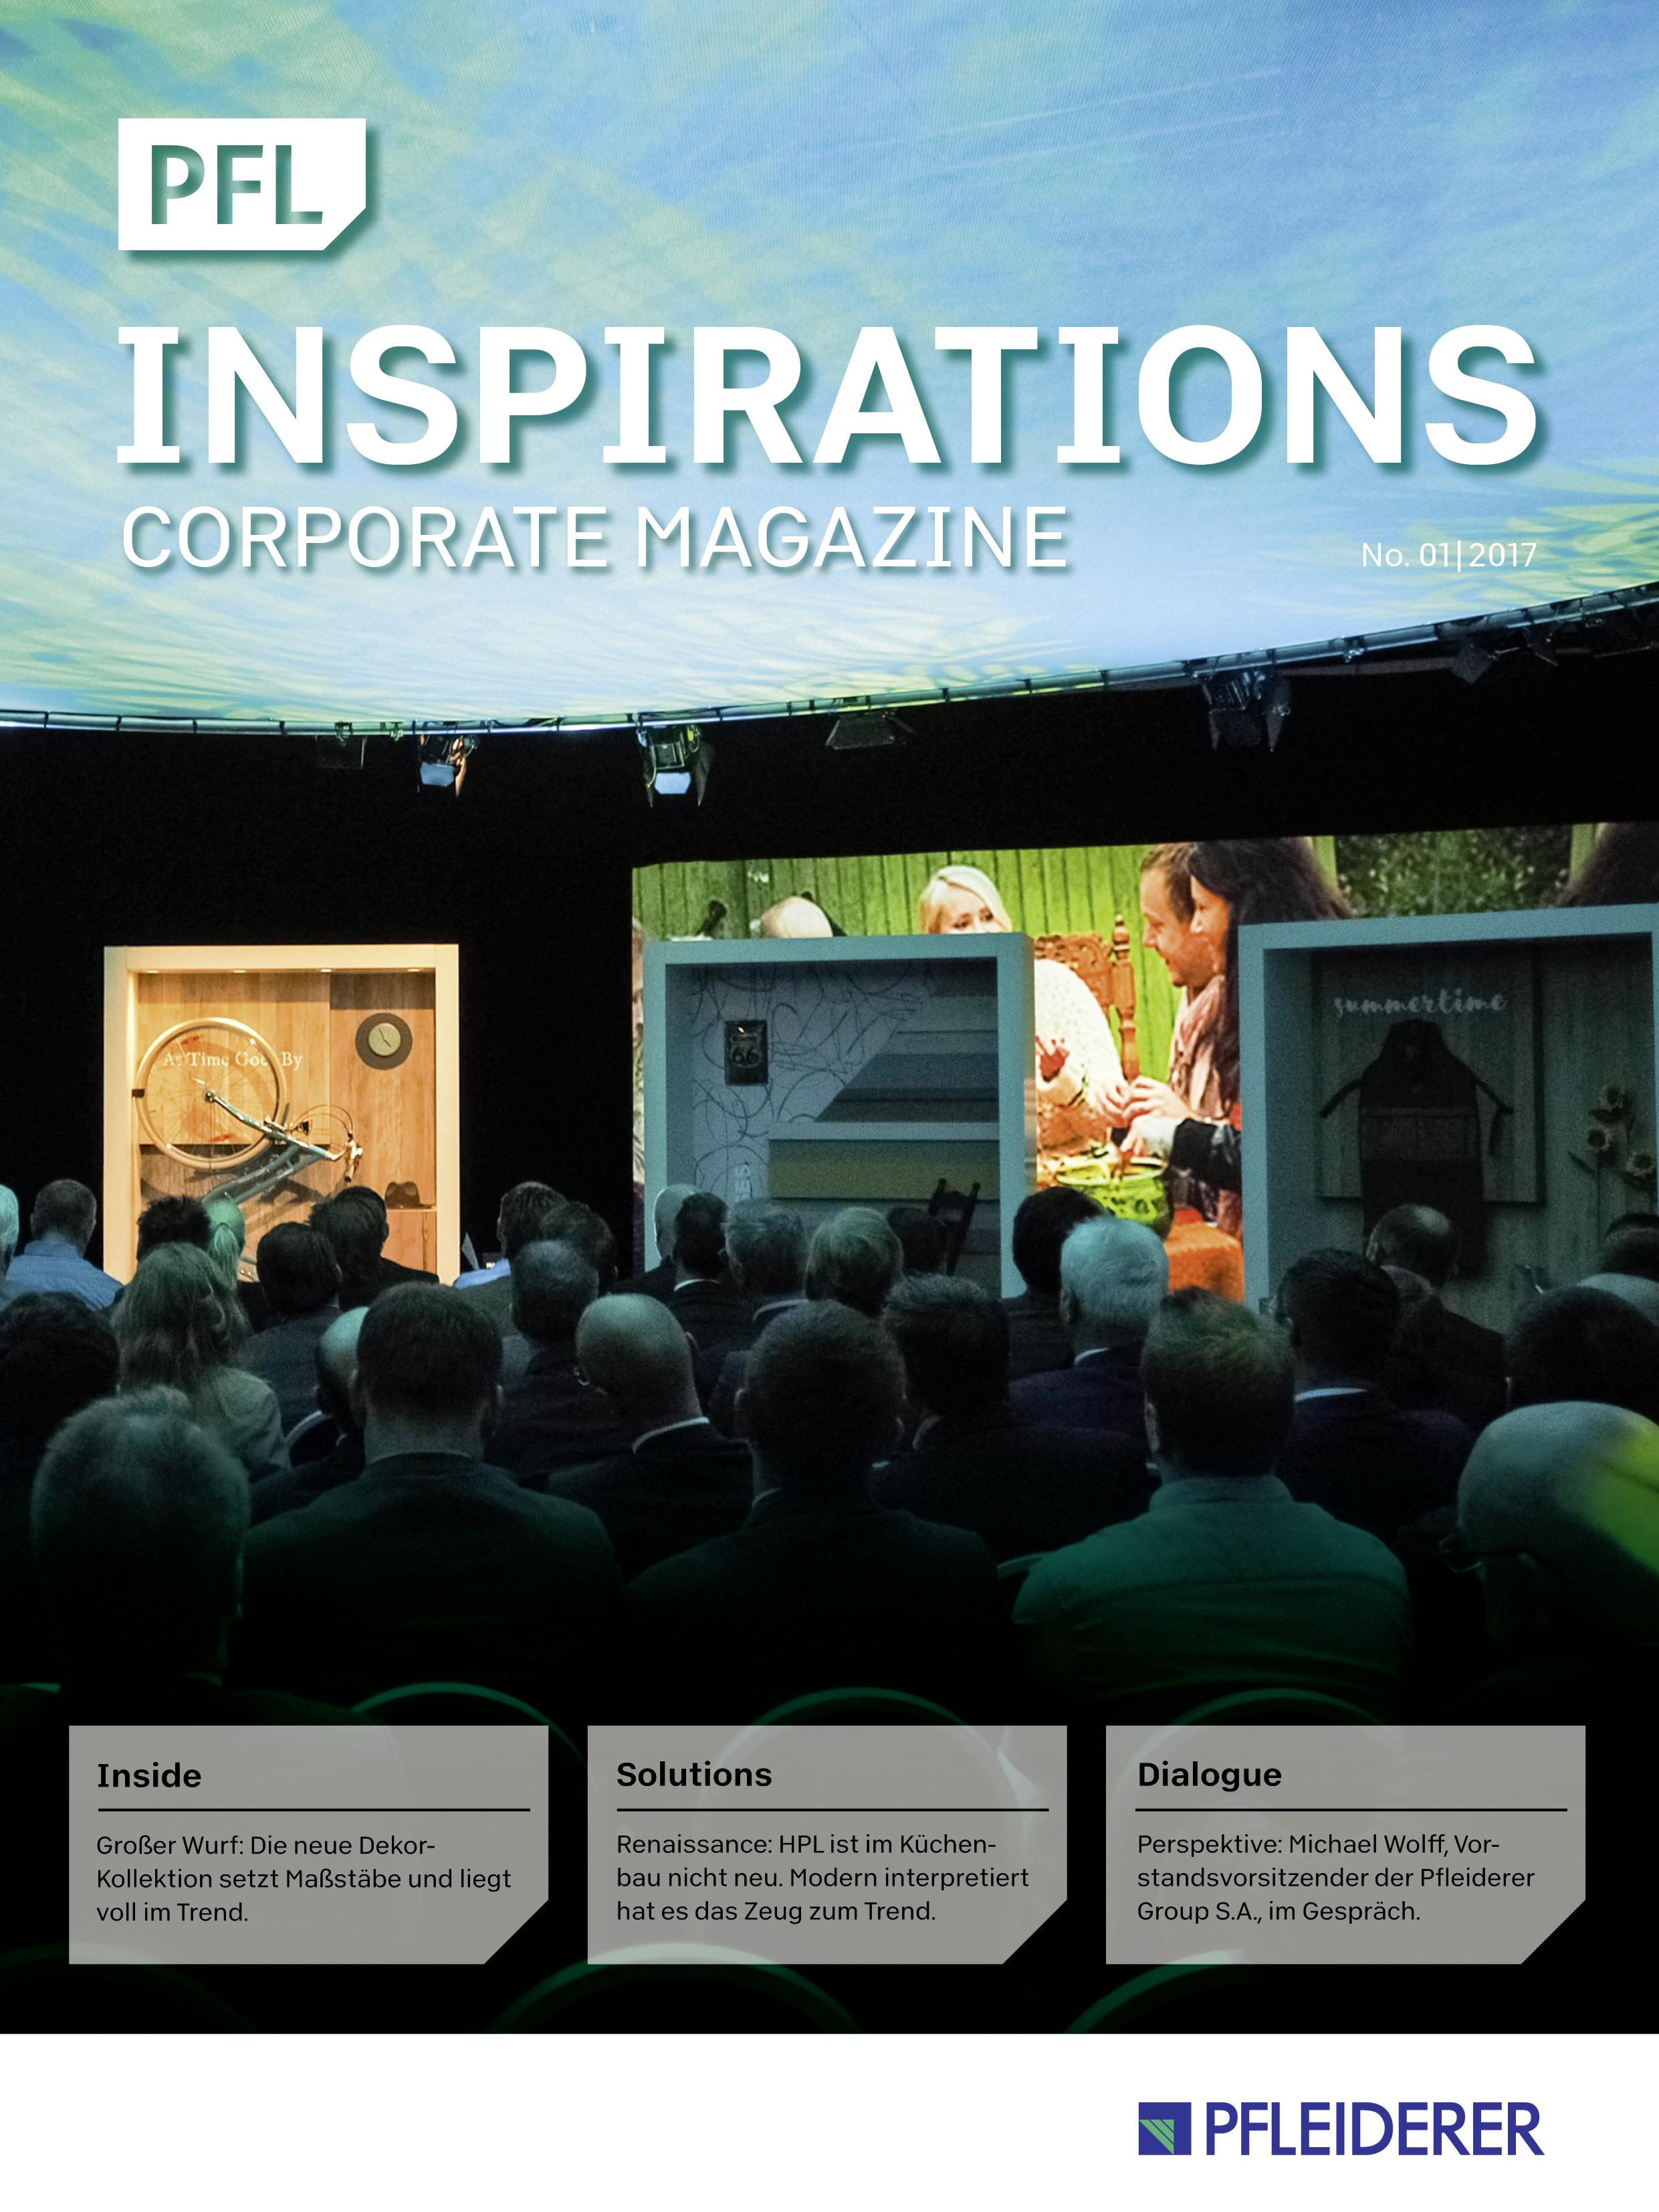 PFL Inspirations 1/17